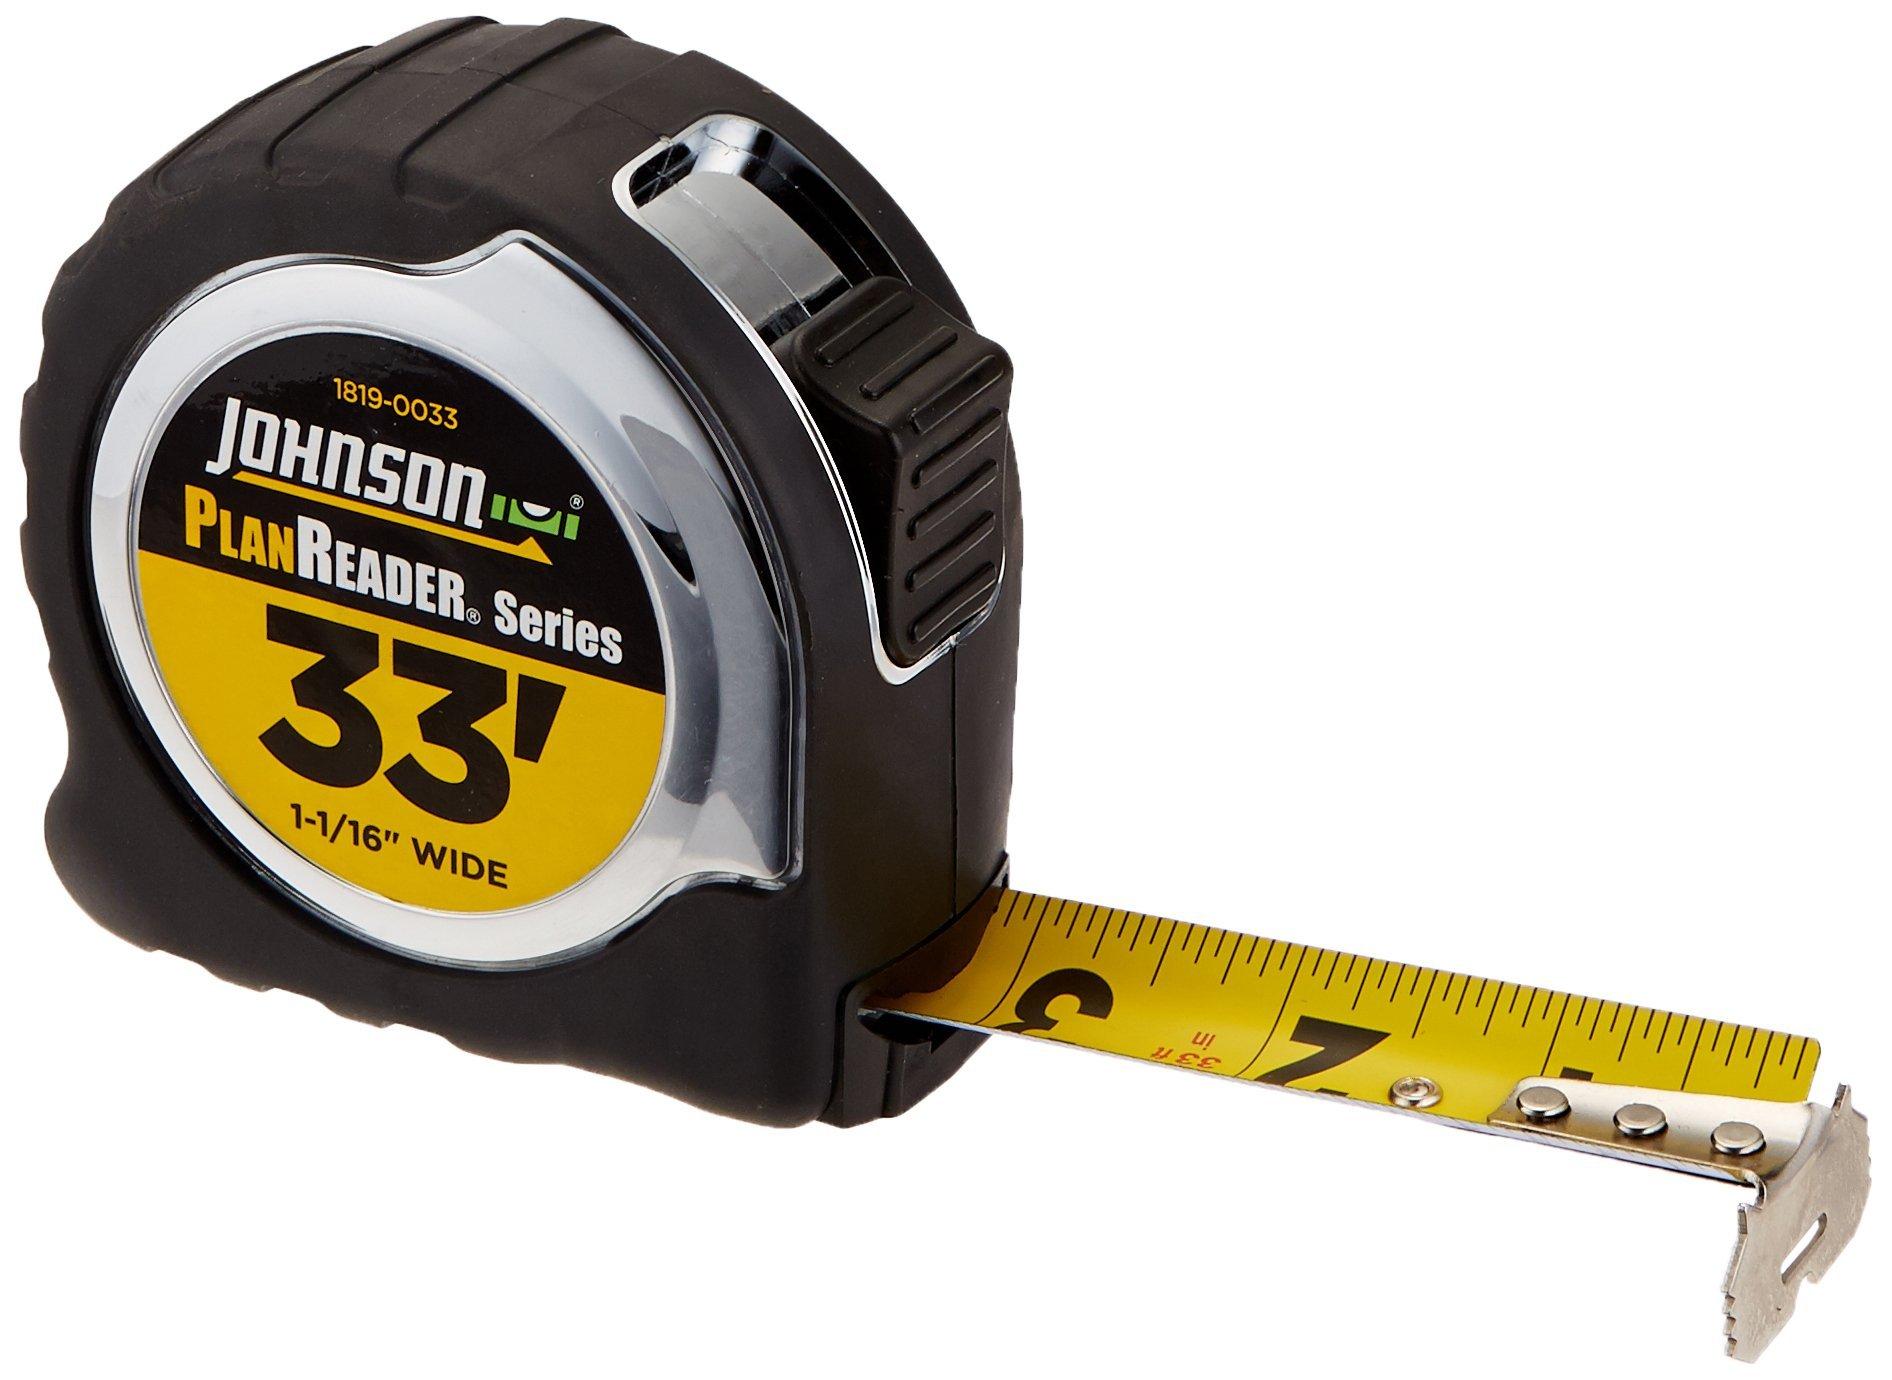 Johnson Level 1819-0033 33-Foot Plan Reader Power Tape, Black/Silver by Johnson Level